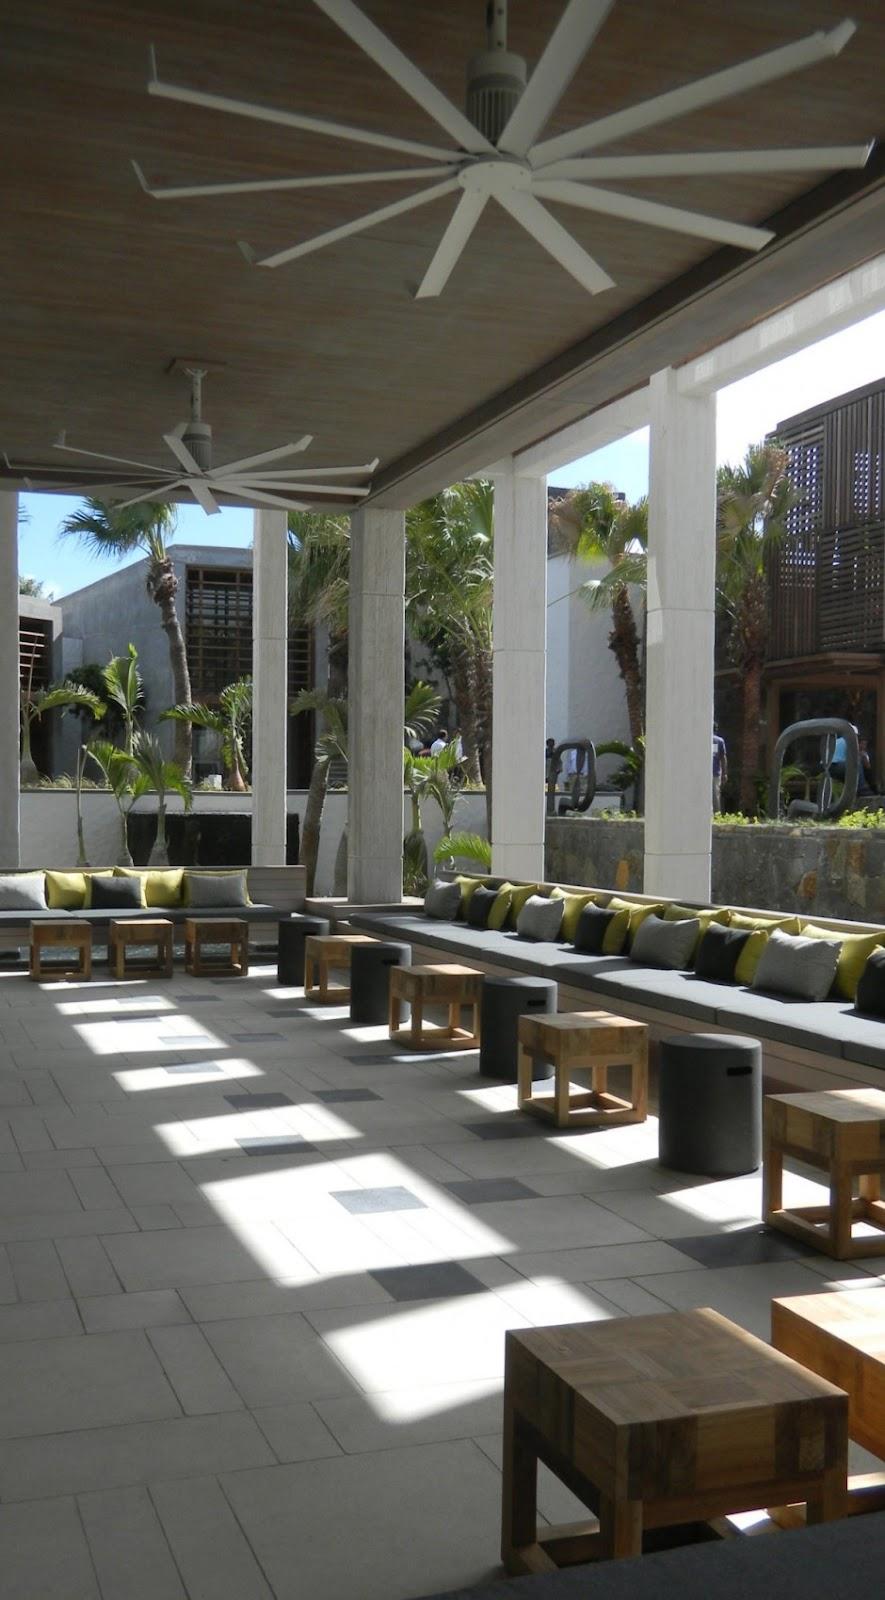 nemm design lifestyle long beach hotel a modern gem. Black Bedroom Furniture Sets. Home Design Ideas